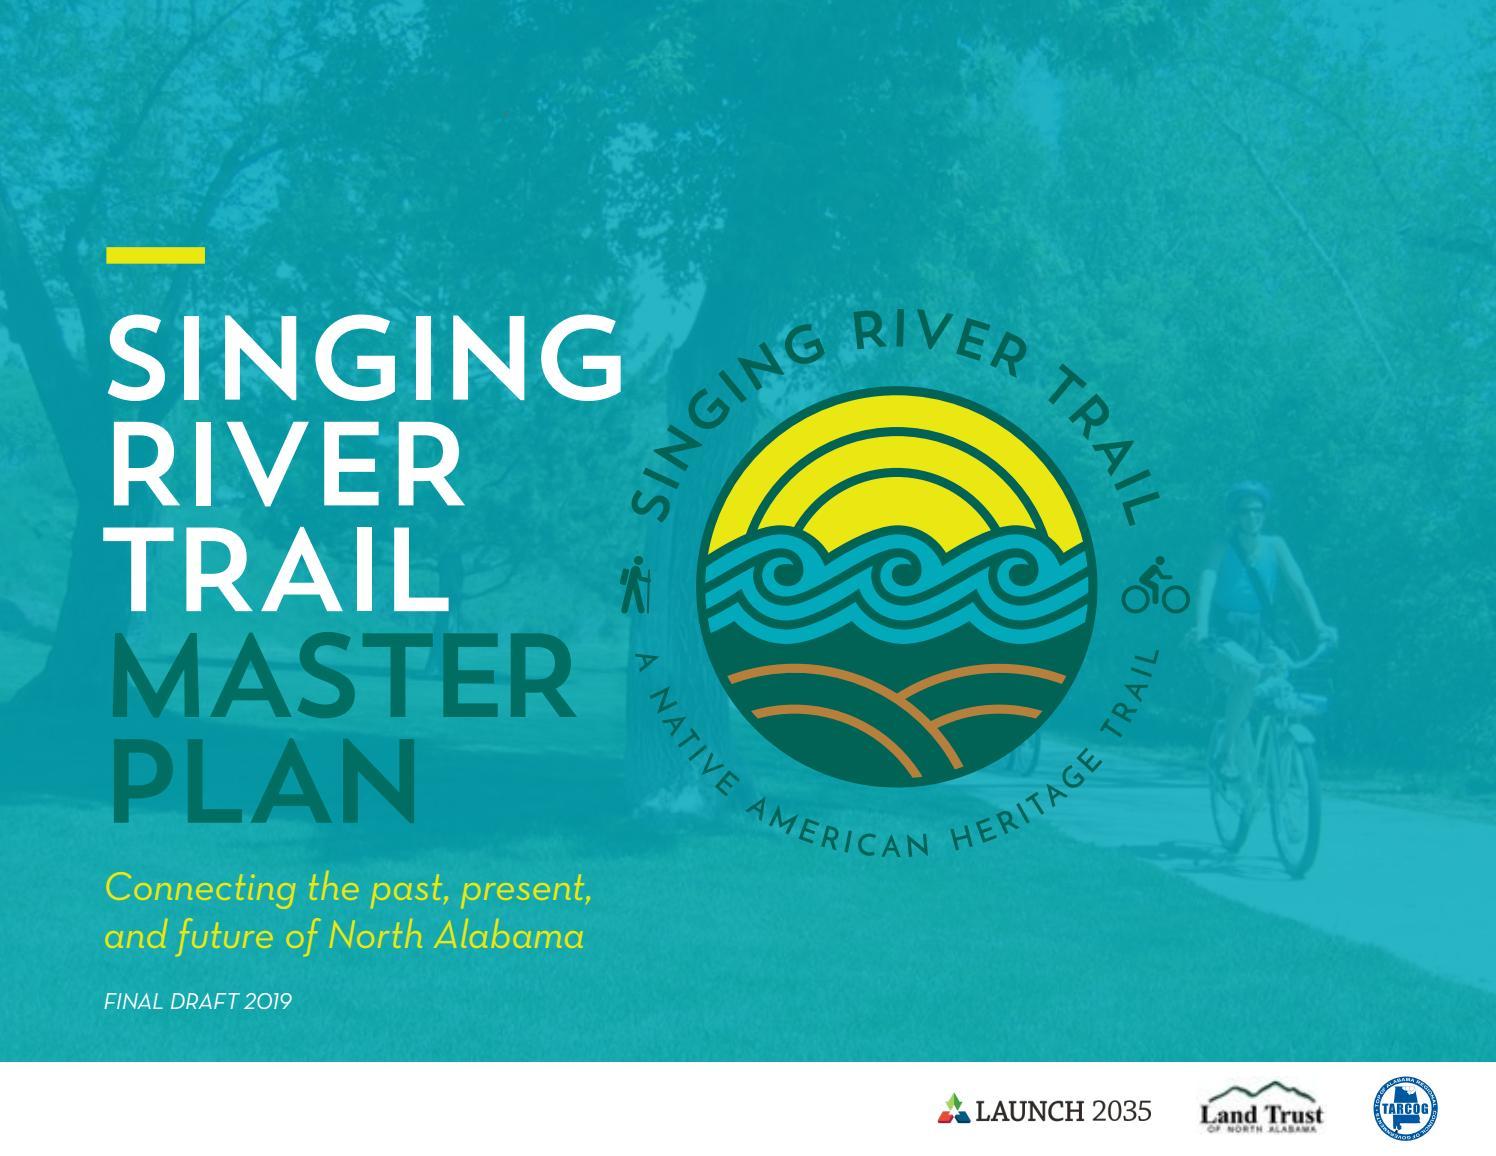 Singing River Trail Master Plan - Draft by Alta Planning +